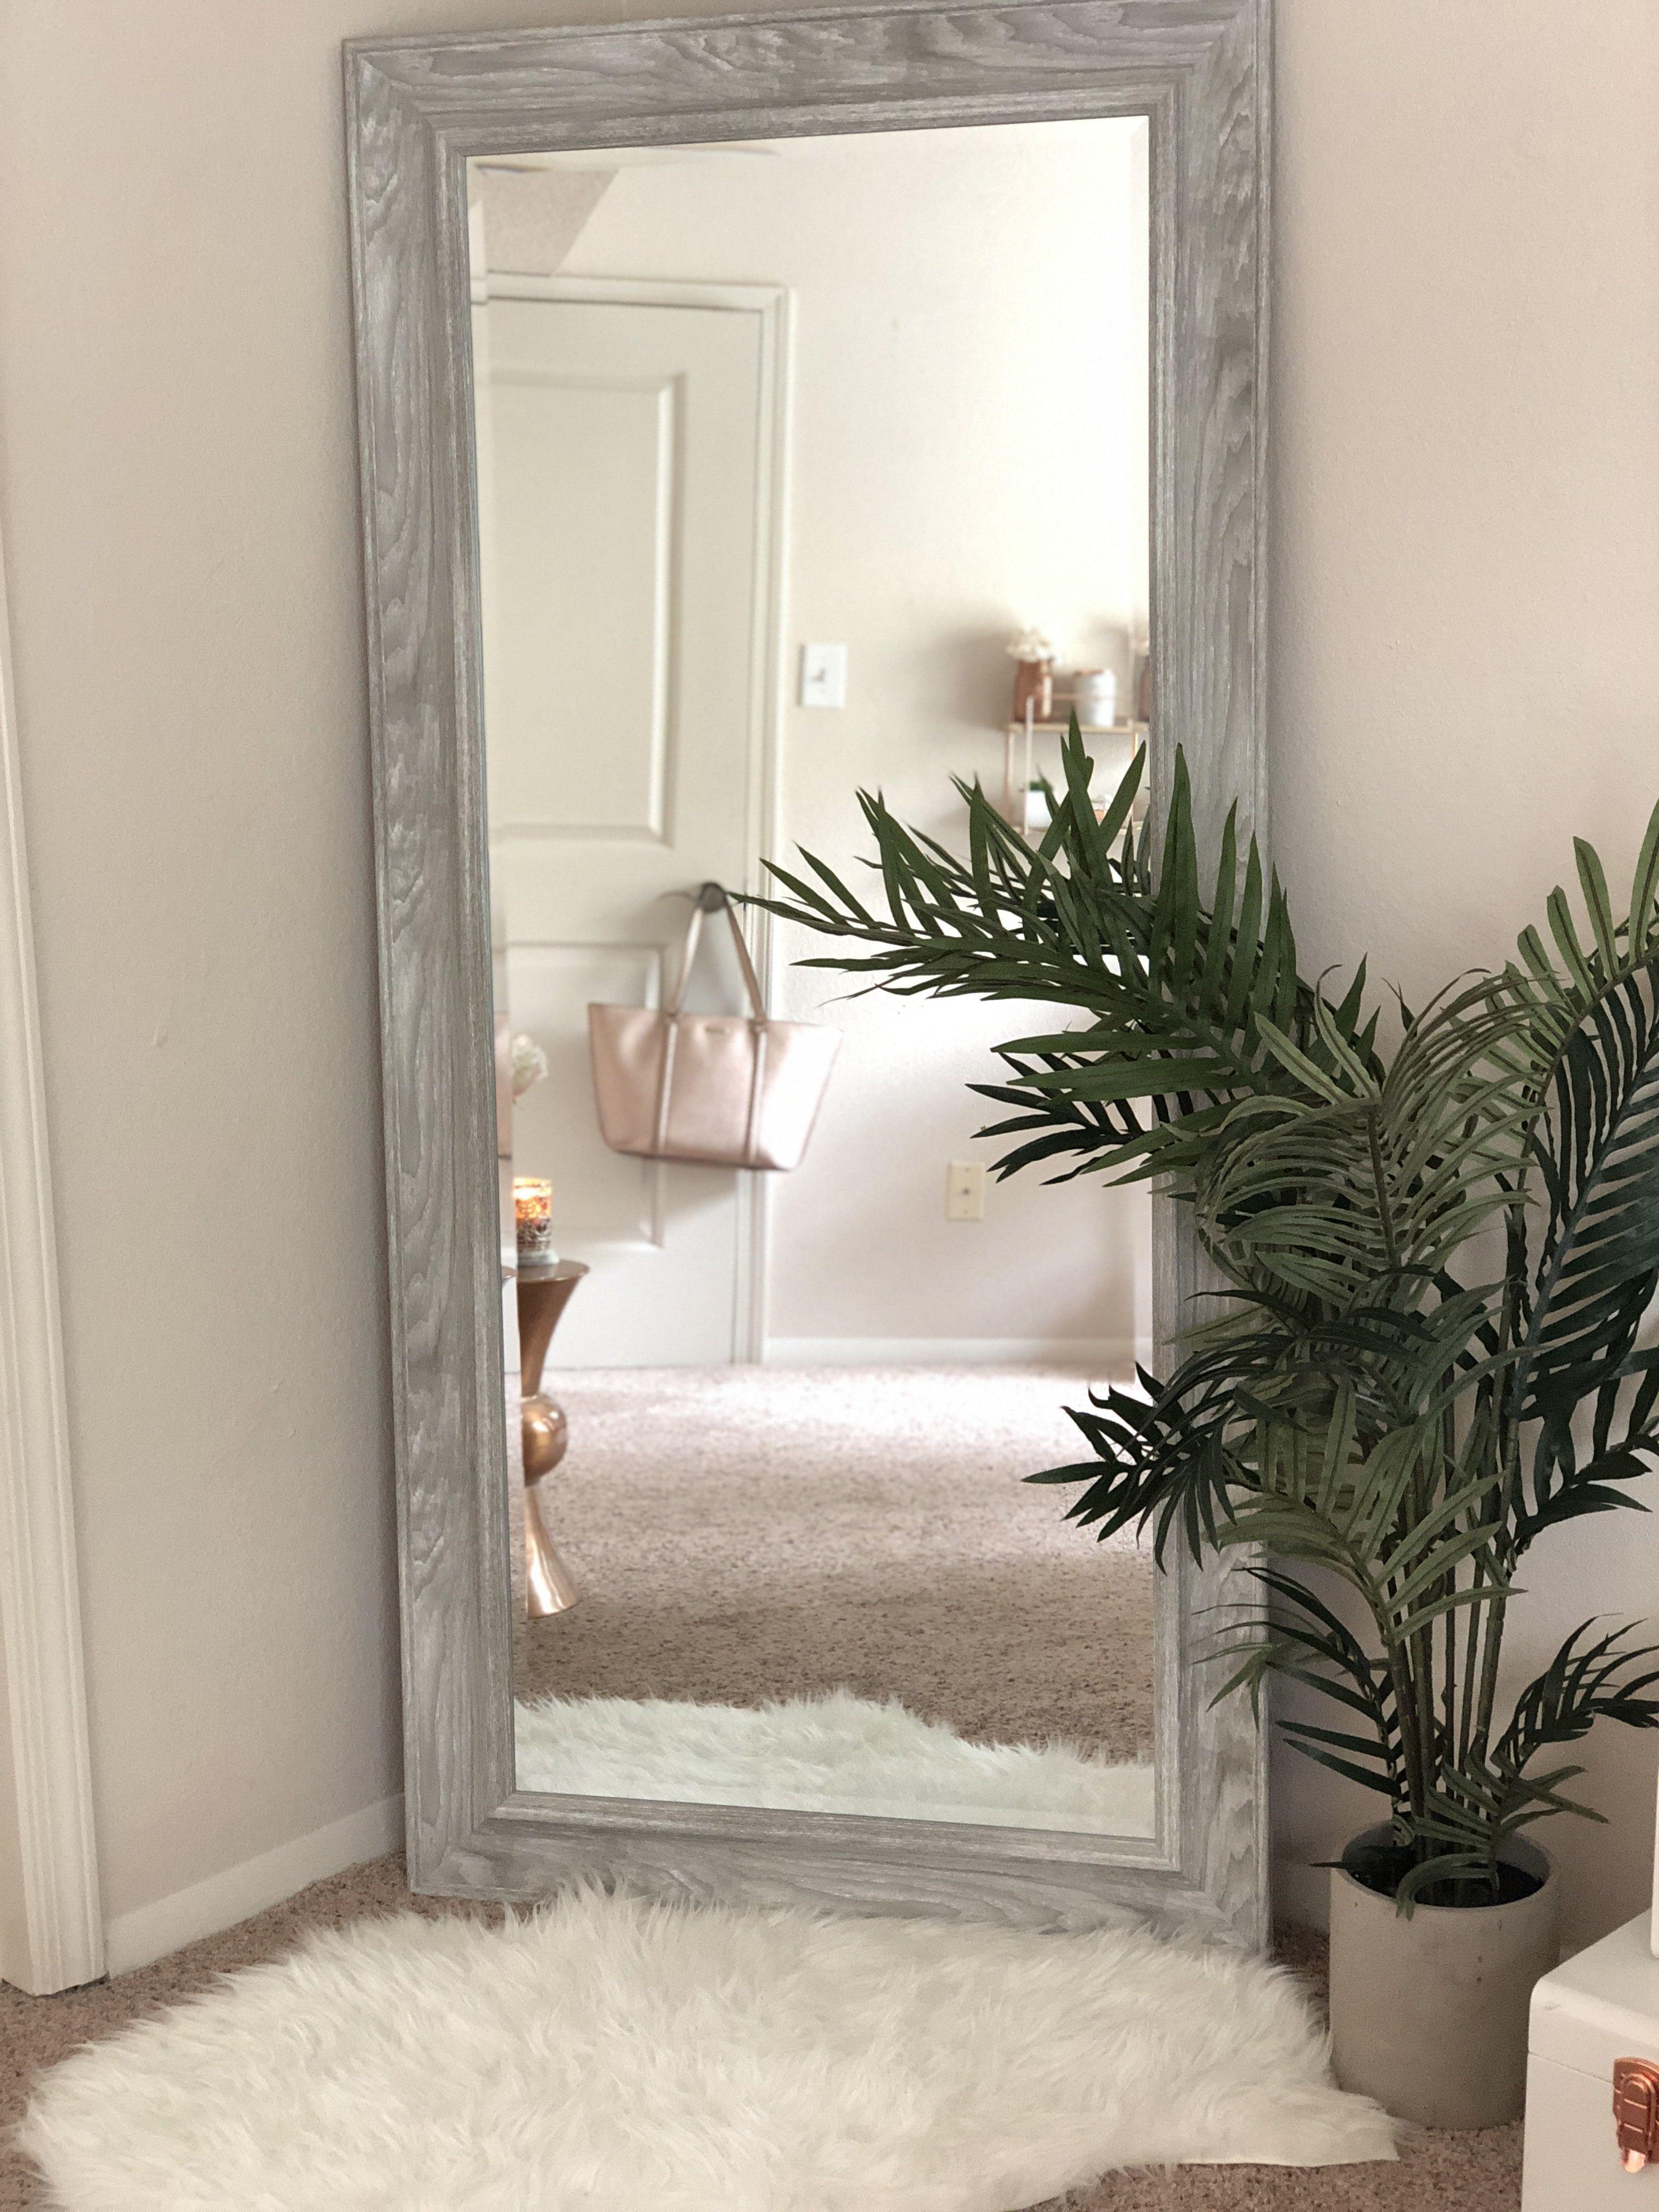 Bedroom With Spacious Floor Mirror Wood Mirror Mango Wood Natural Home Decor